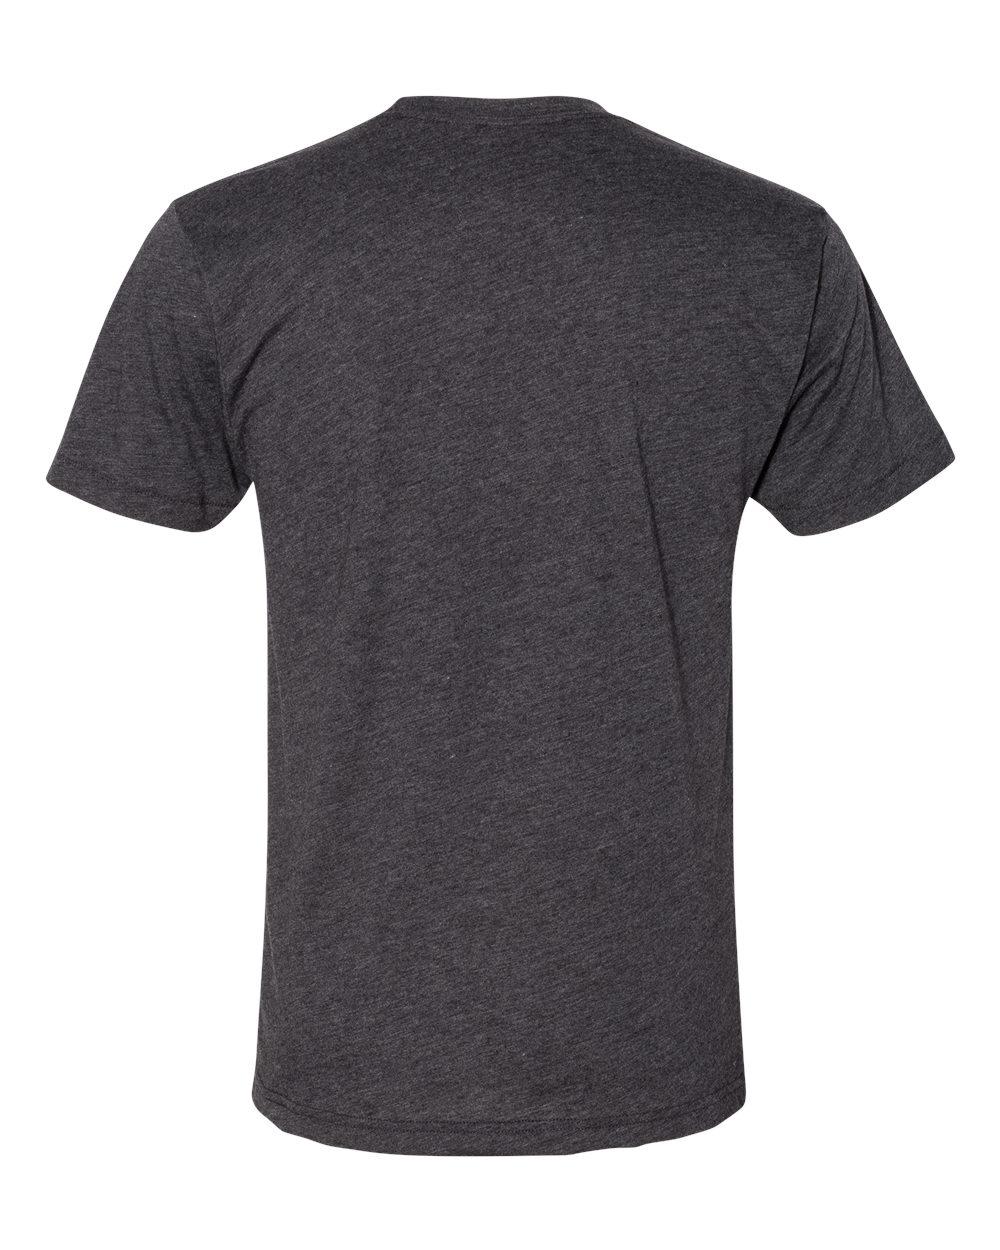 American-Apparel-Mens-Slim-Fit-50-50-Cotton-T-Shirt-Tee-BB401W-up-to-2XL thumbnail 16